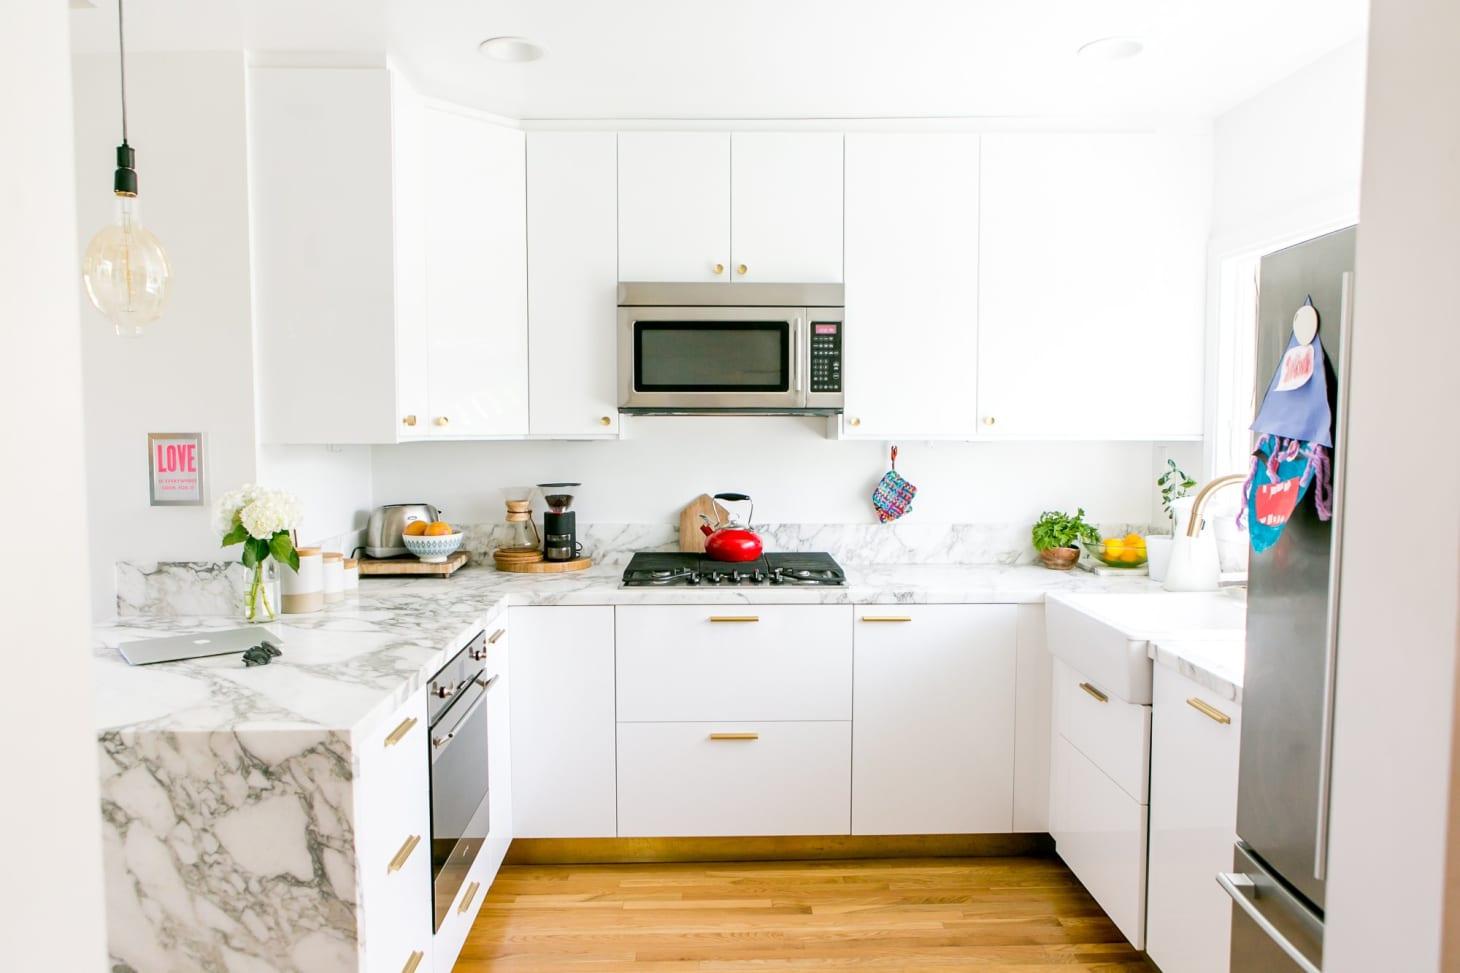 25 Beautiful White Kitchen Ideas - Design & Decorating Tips ...